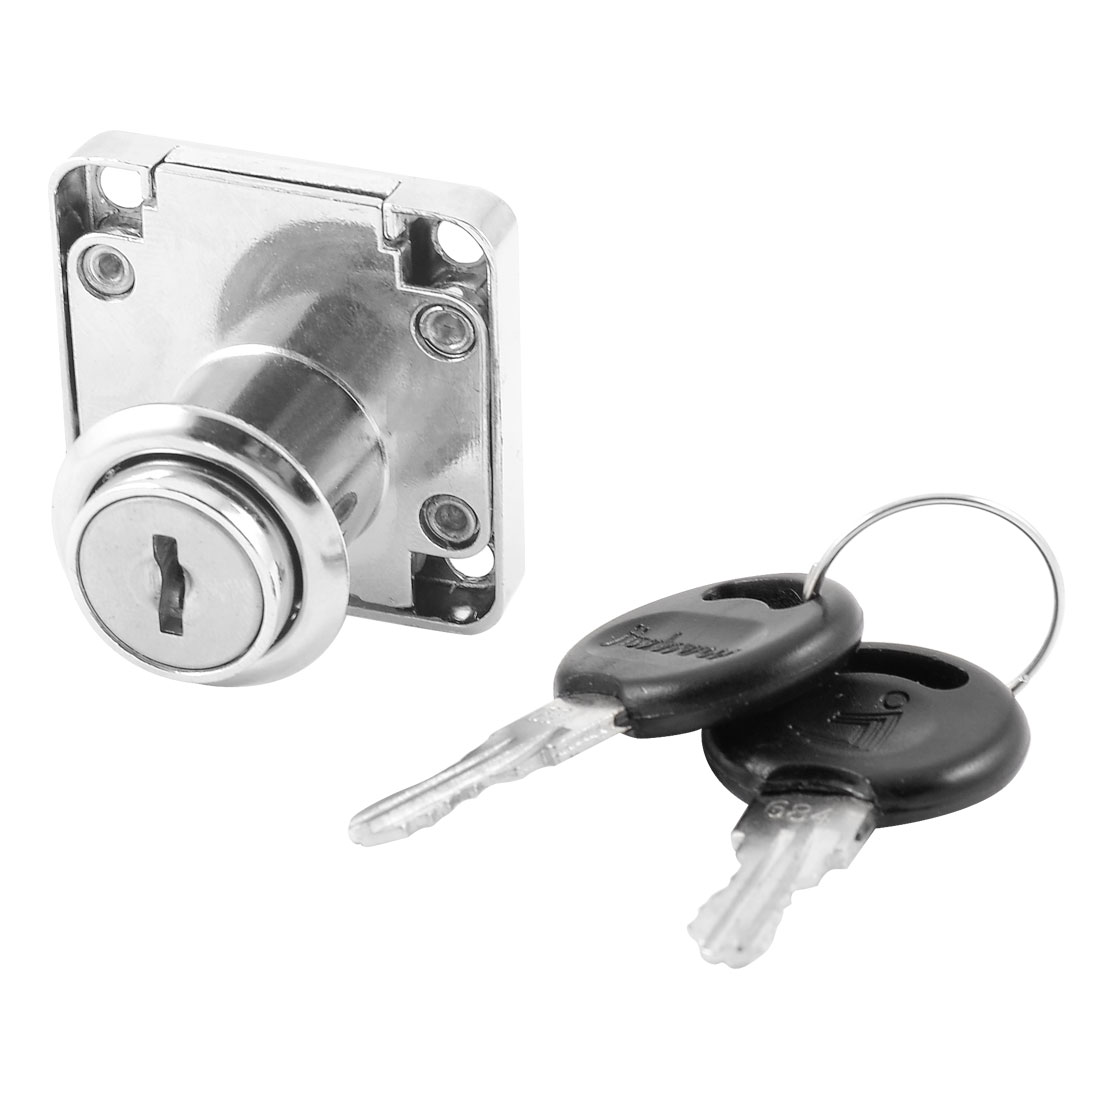 19mm Dia Cylinder Head Silver Tone Metal Furniture Desk Drawer Lock w Keys